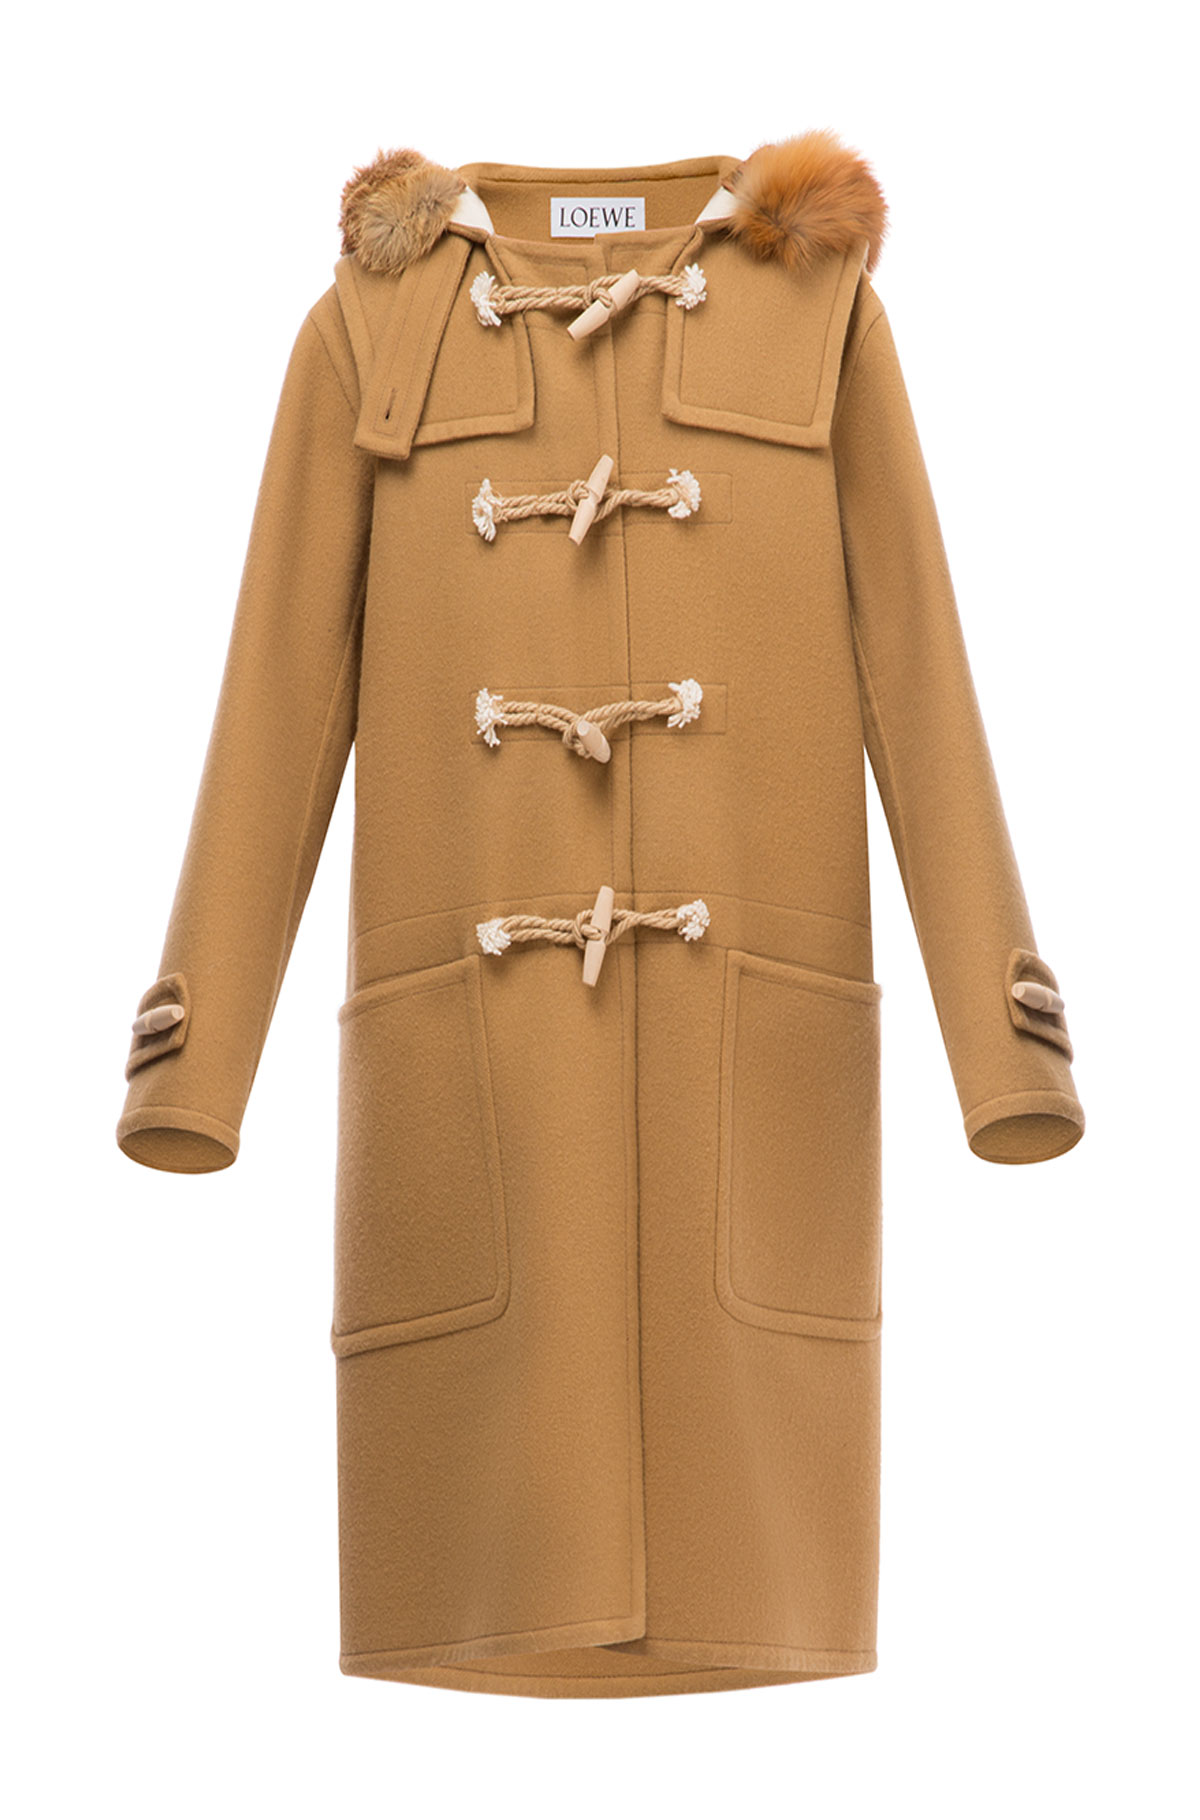 LOEWE Duffle Coat Fox Trim Hood Camel front